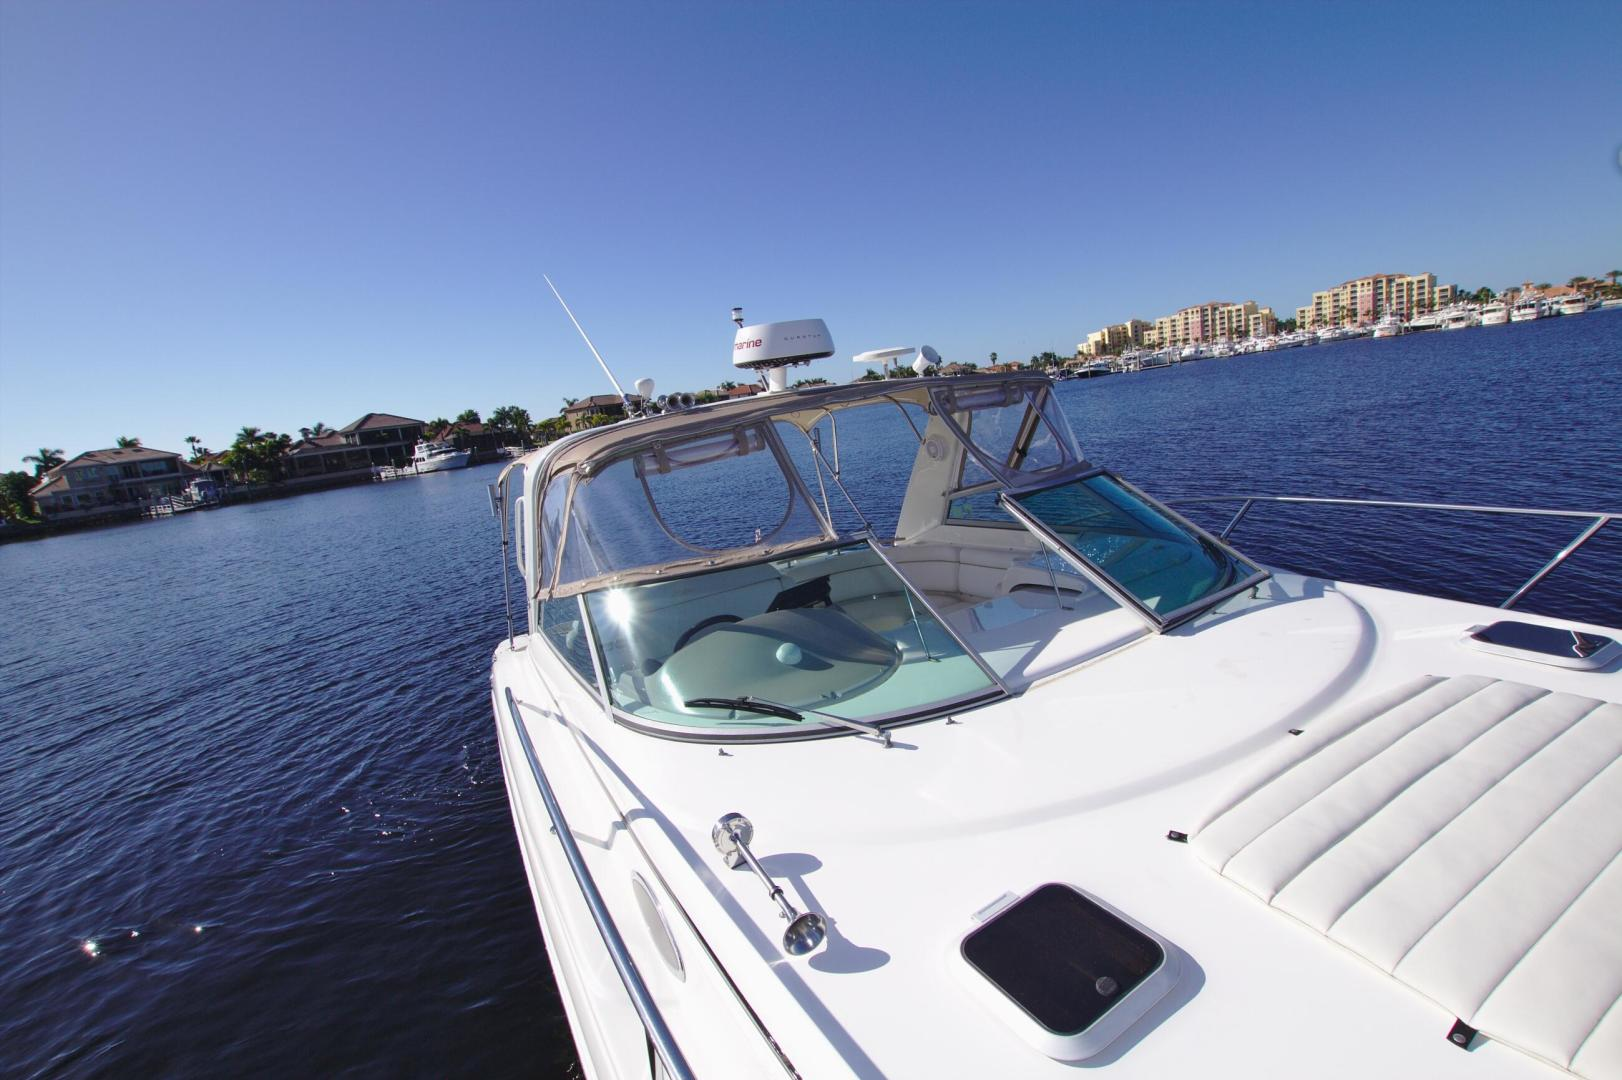 Rinker-342 Express Cruiser 2006-Salt Shaker Palmetto-Florida-United States-1587722 | Thumbnail